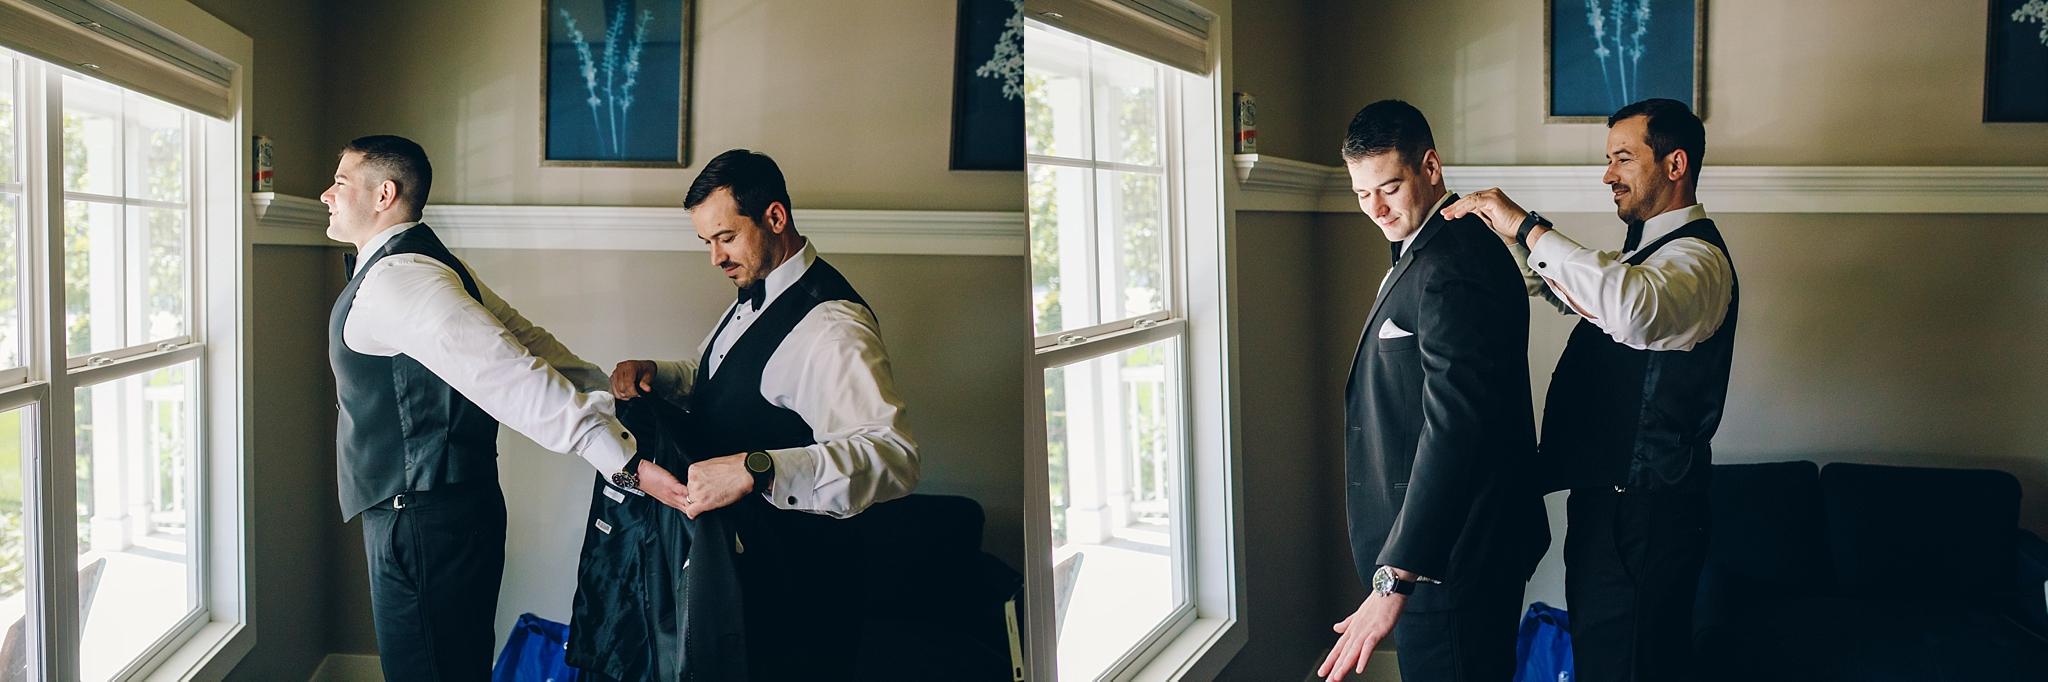 baker-lofts-holland-michigan-wedding-photographer_0324.jpg